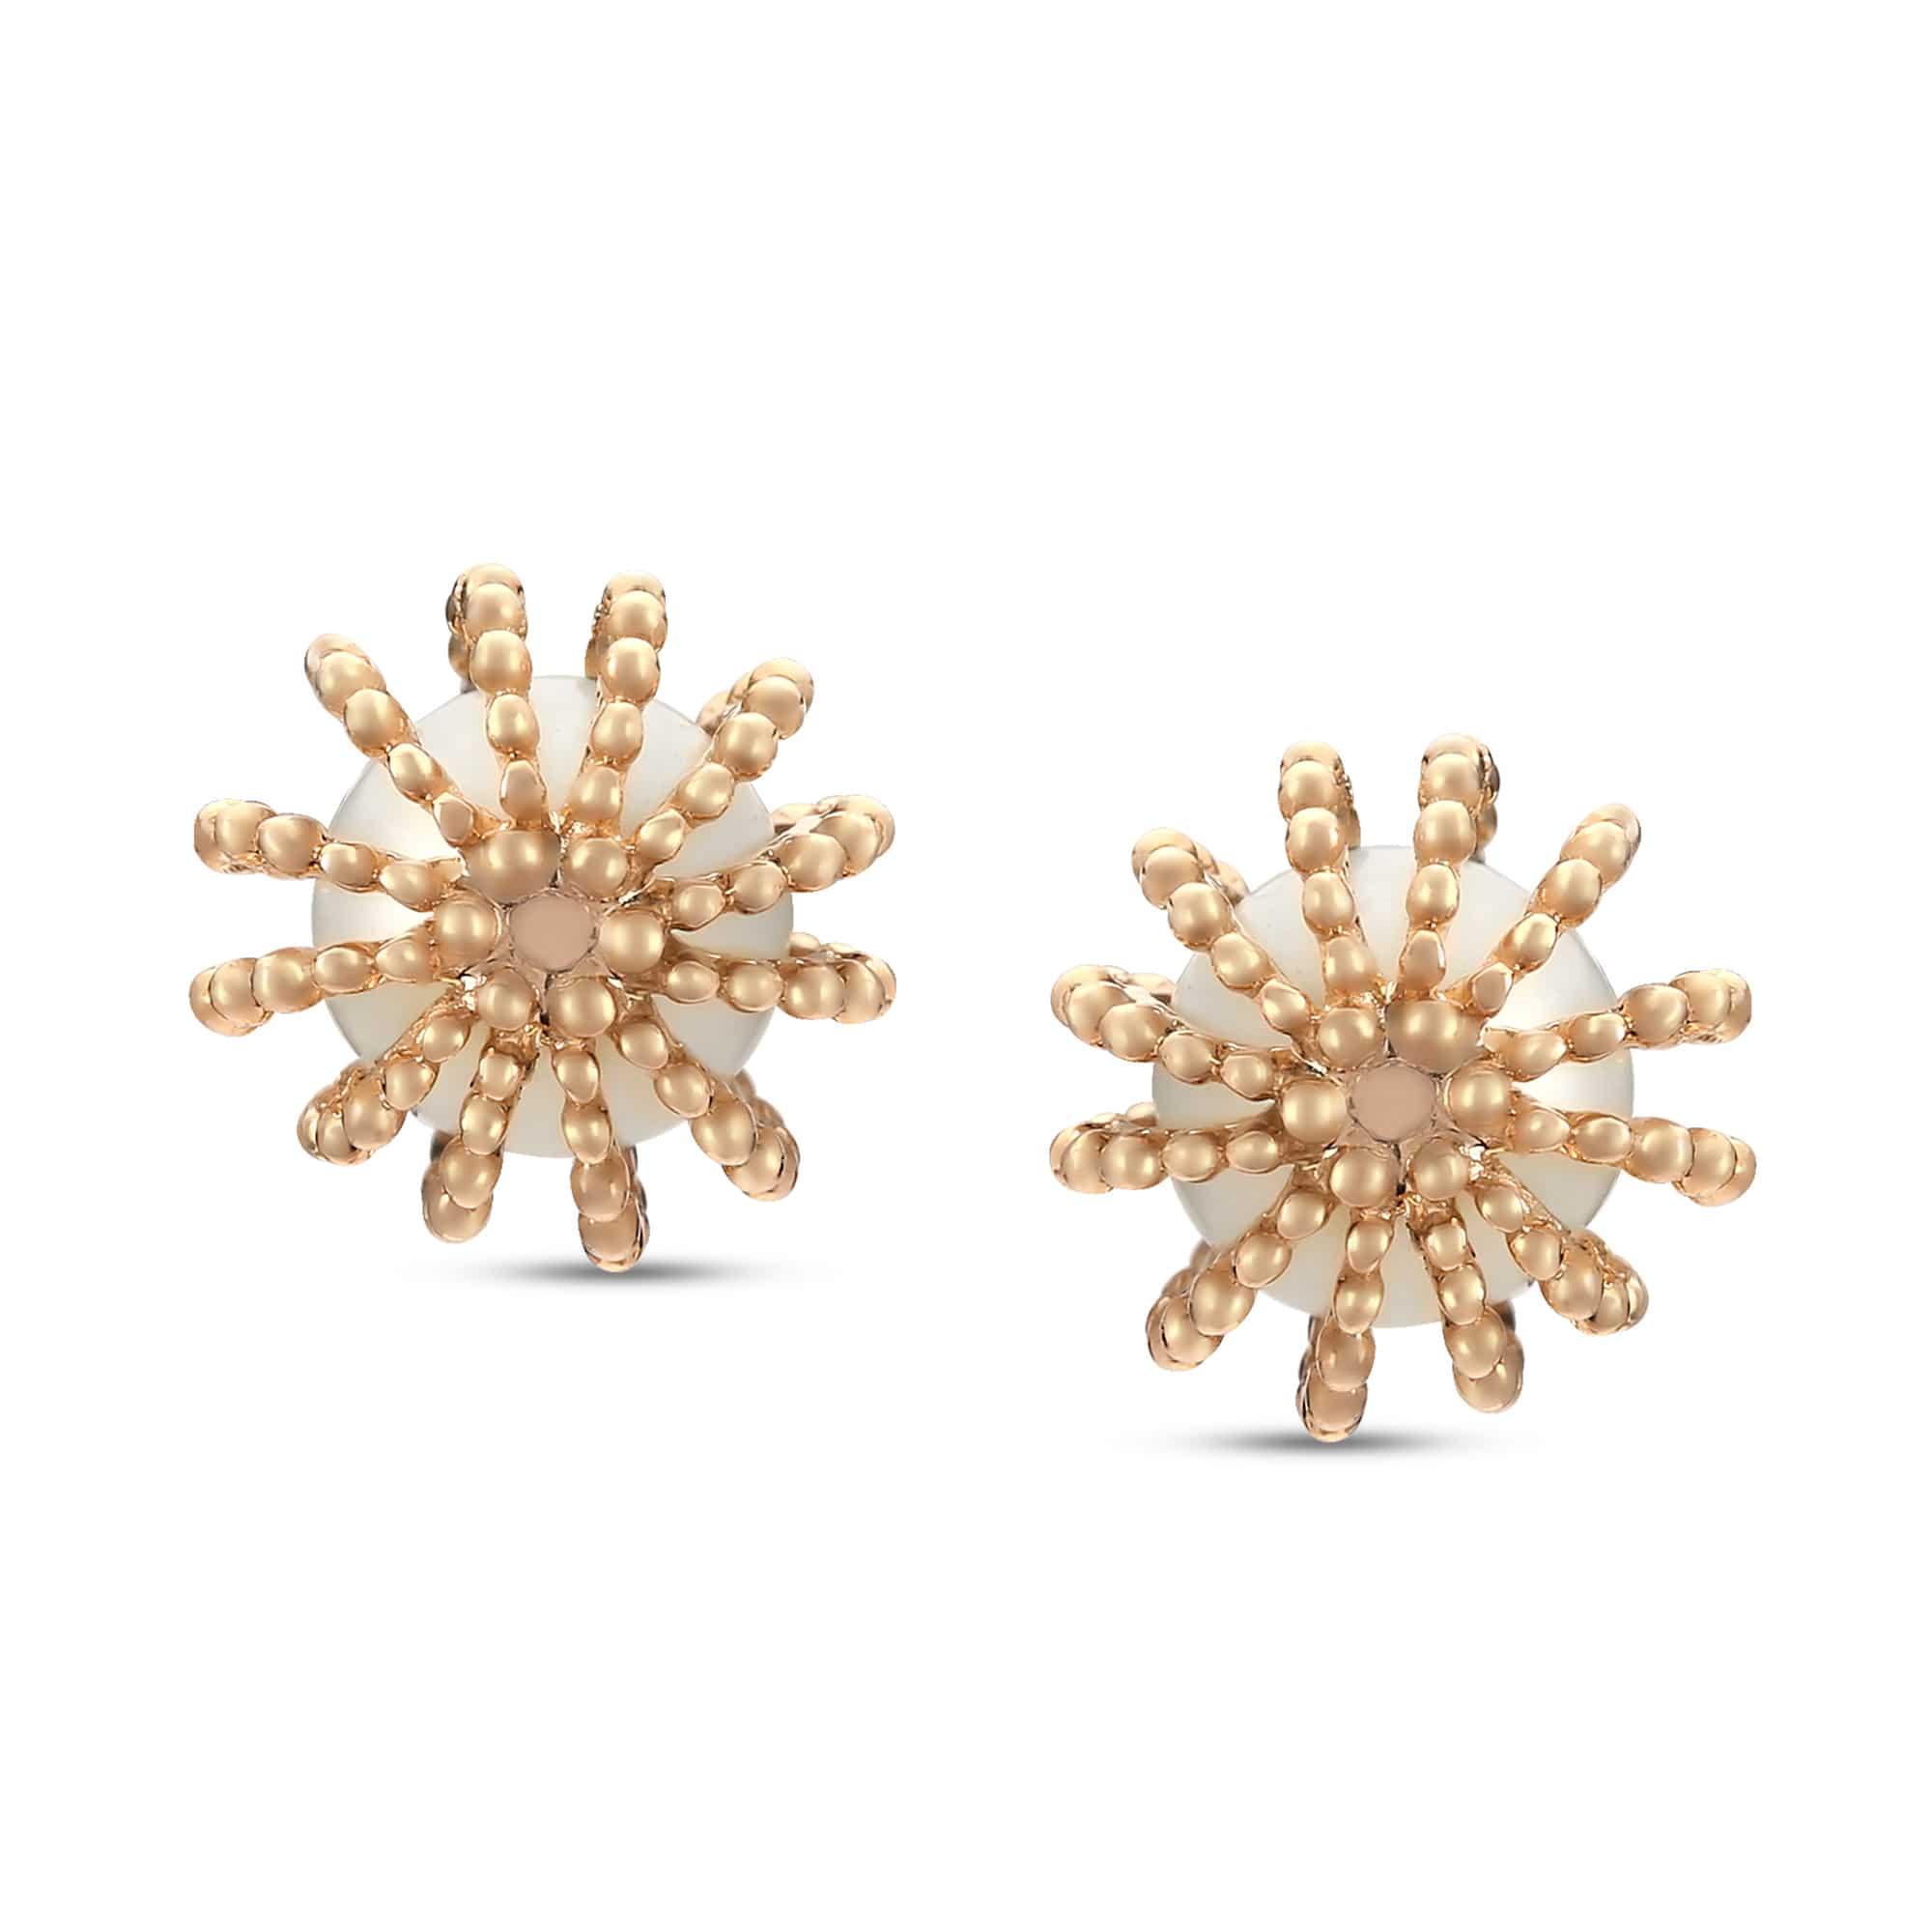 b611db30b Mia All-Rounders by Tanishq 14KT Yellow Gold Pearl Stud Earrings ...